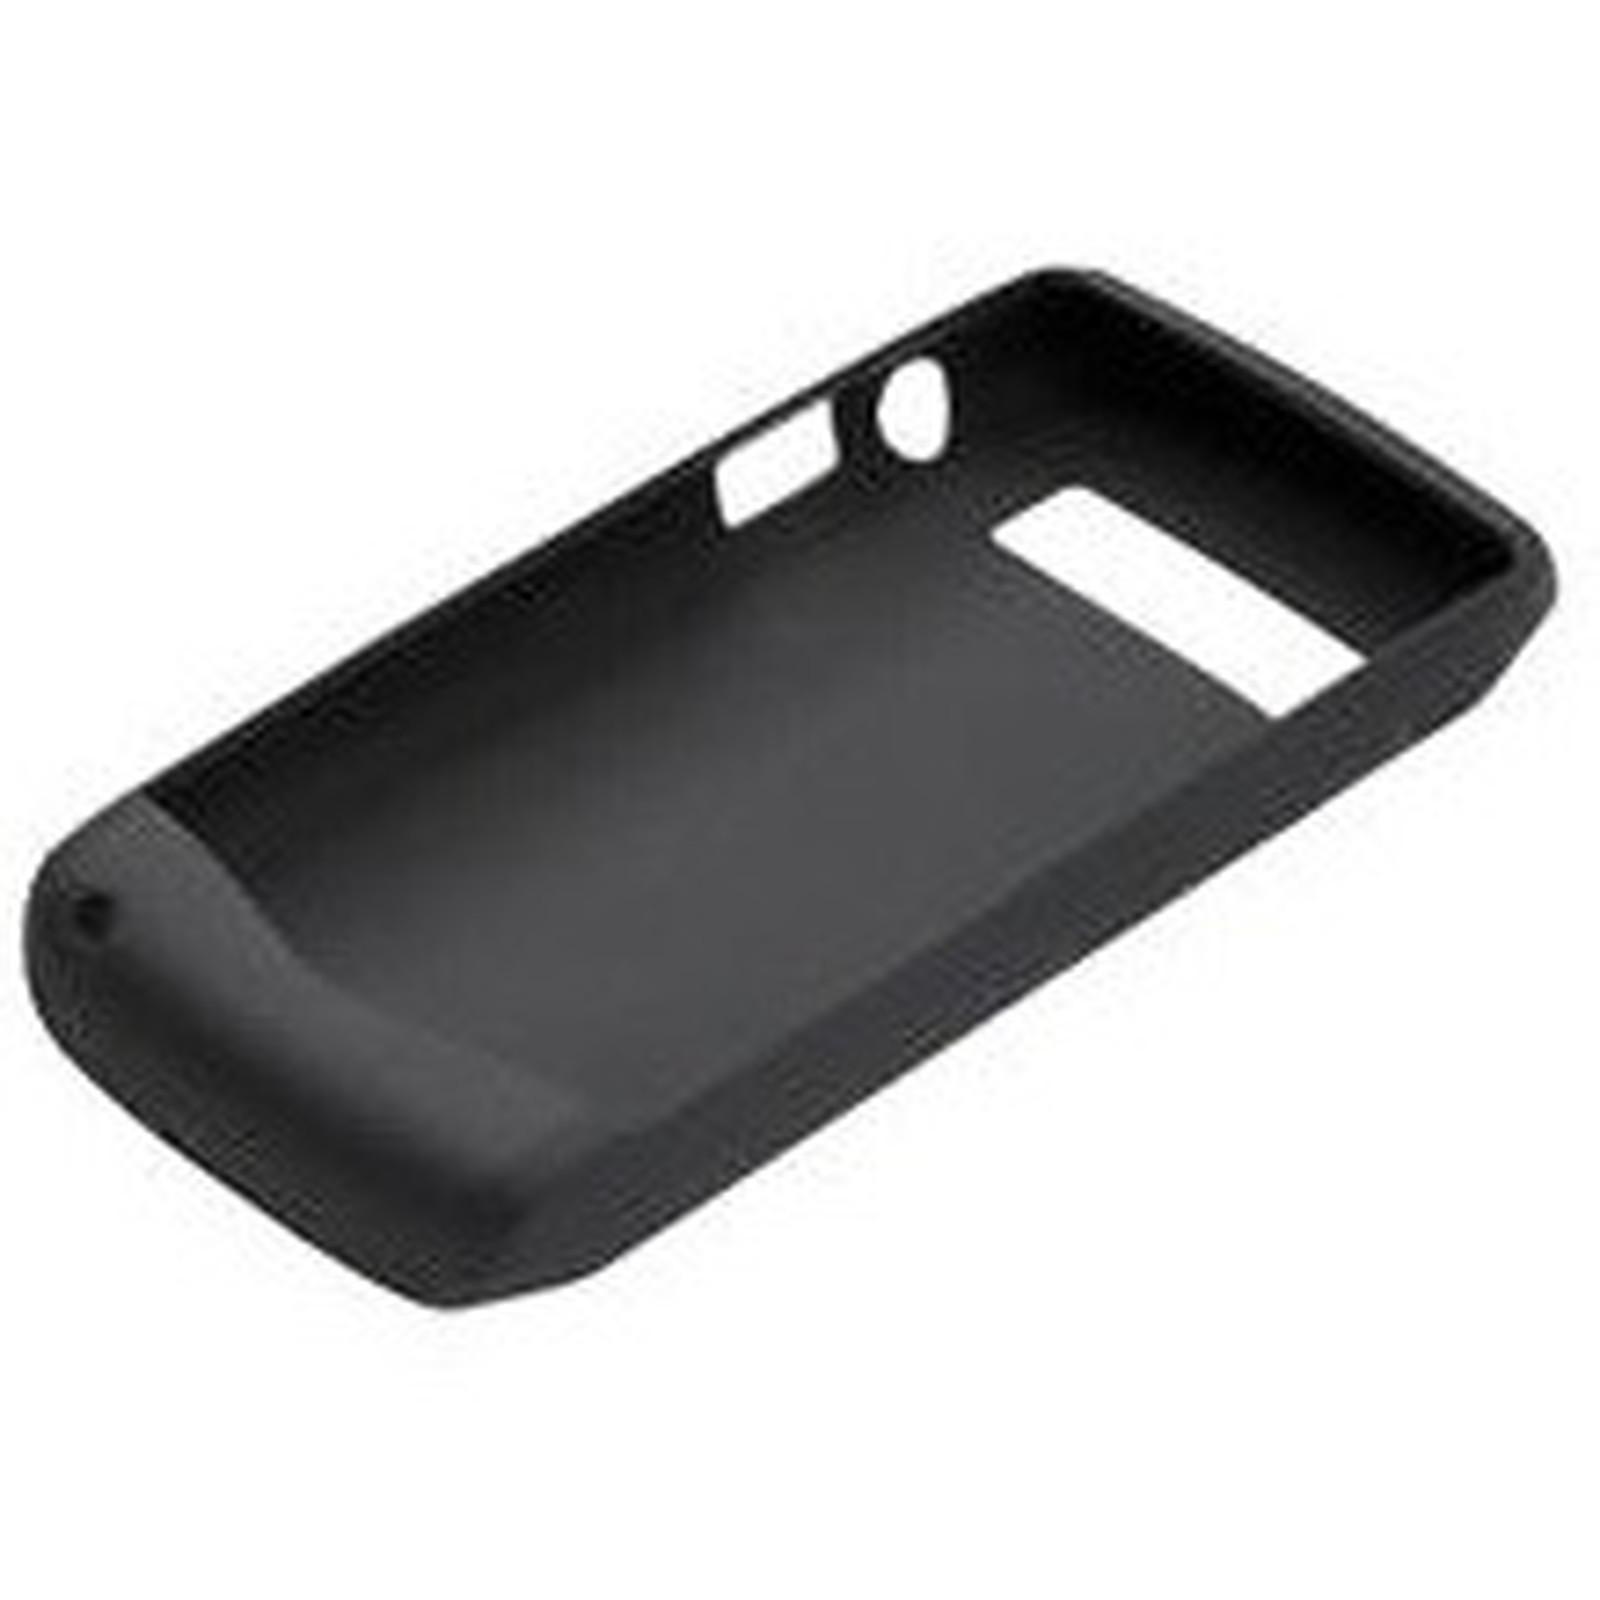 BlackBerry Skin Noir pour Pearl 3G